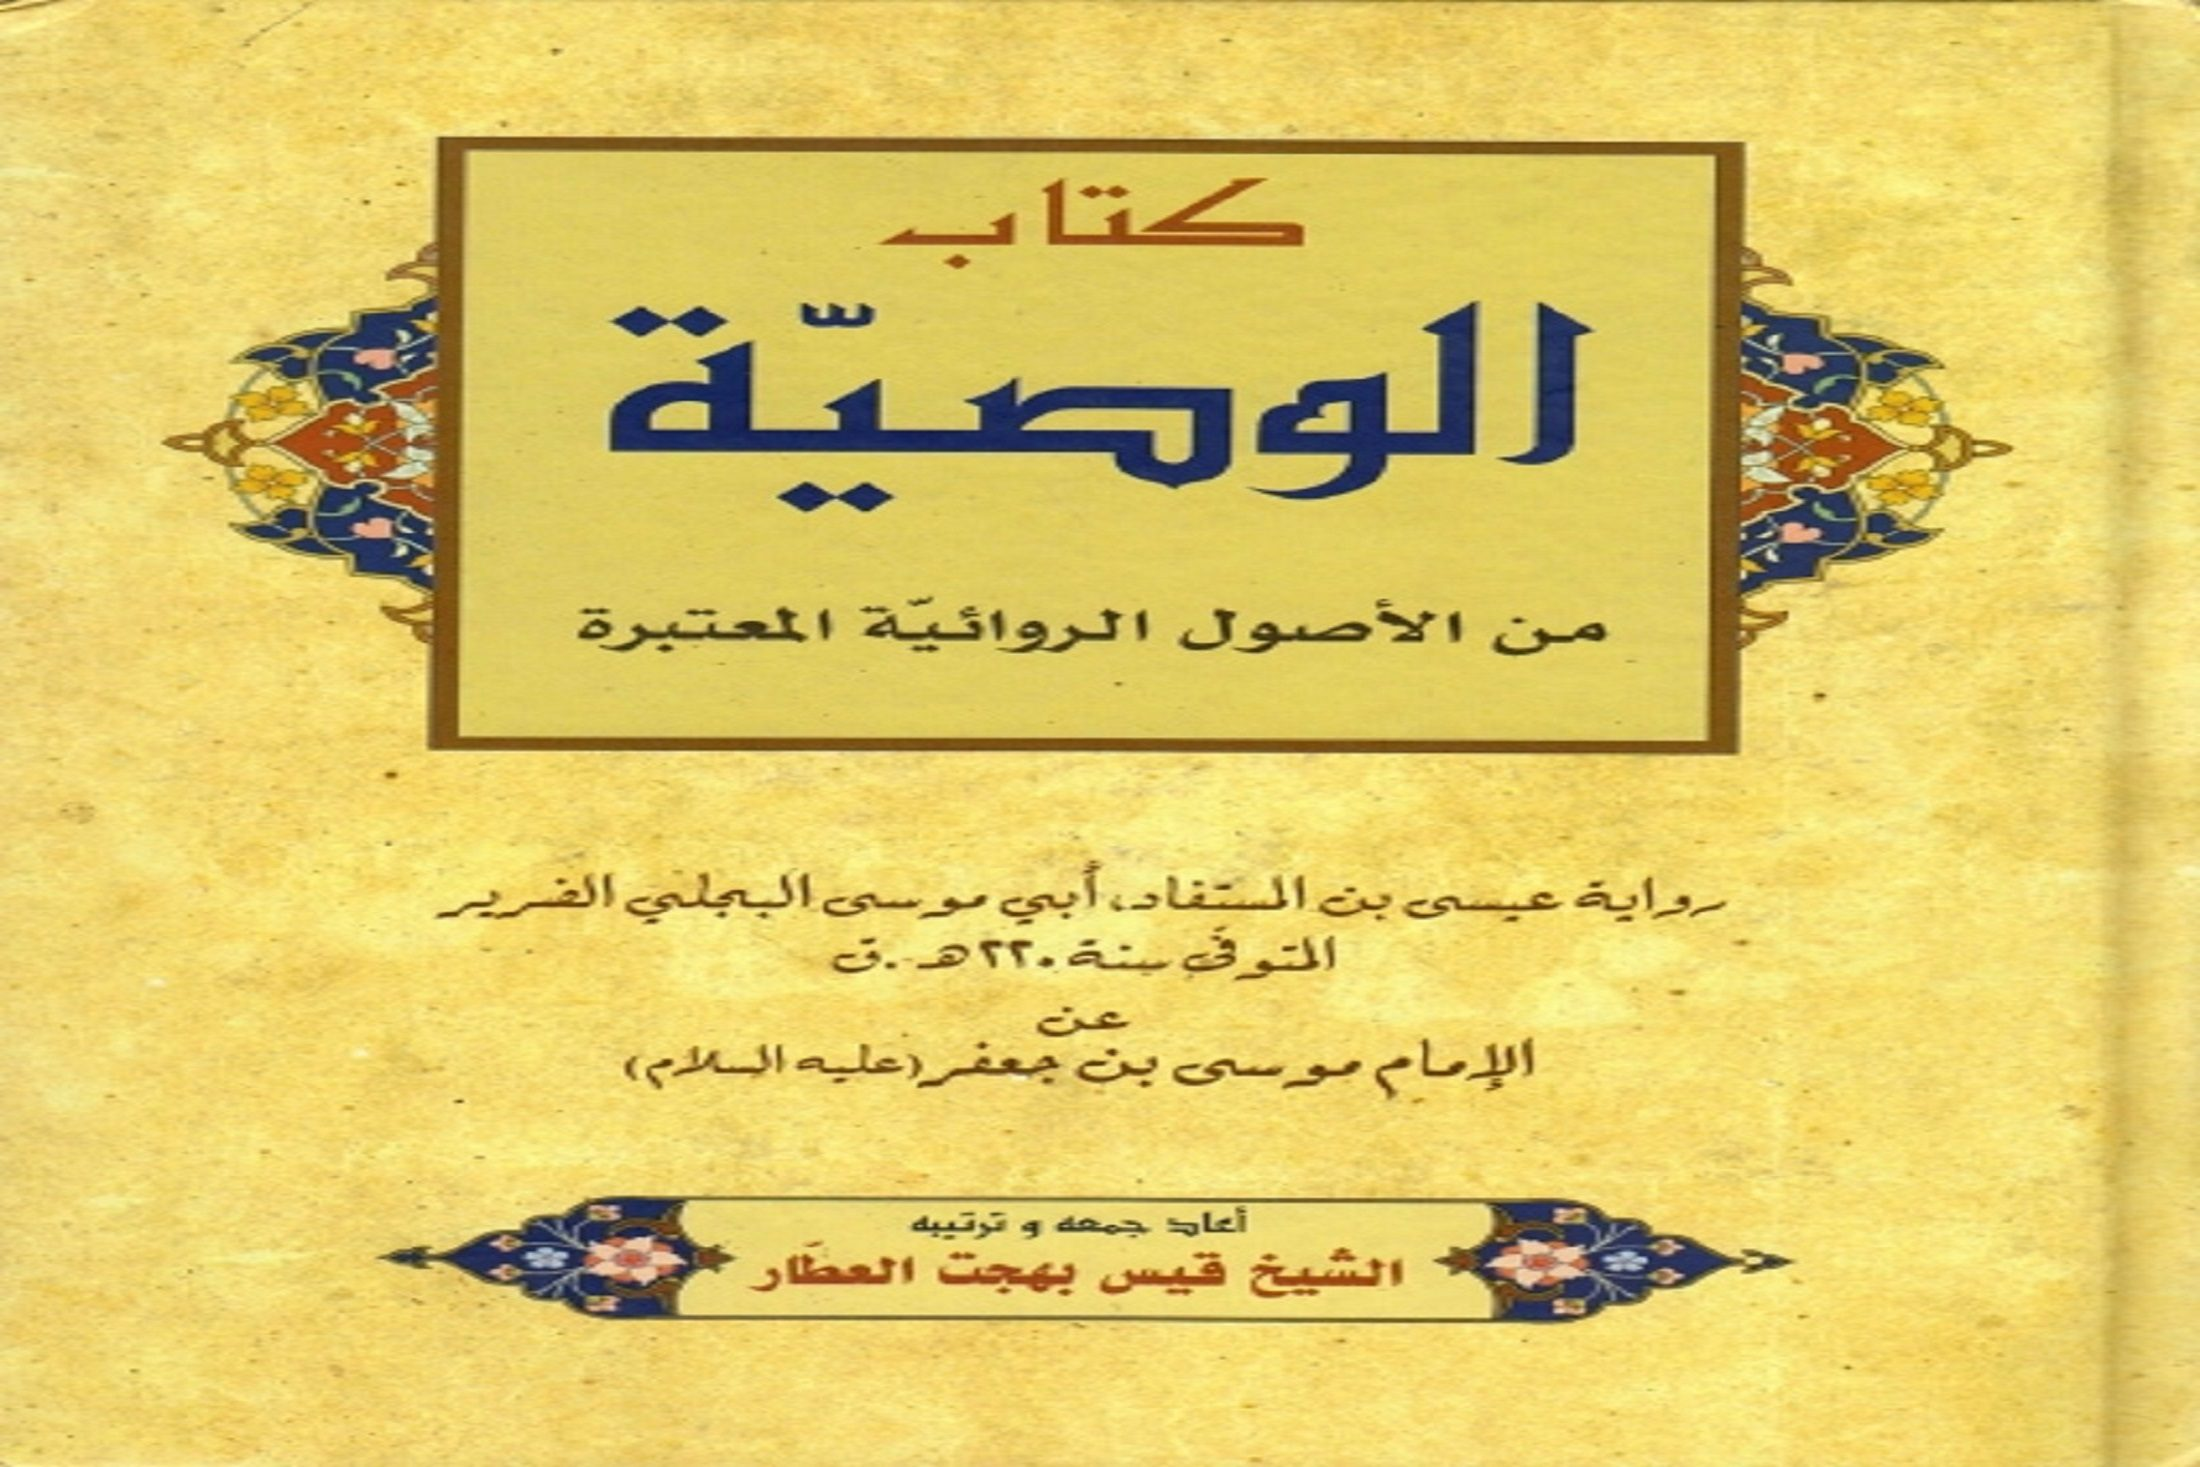 Kitab al-Wasiyyah – Abu Musa Isa b. Mustafad al-Bajali az-Zurair (d. 220 A.H)